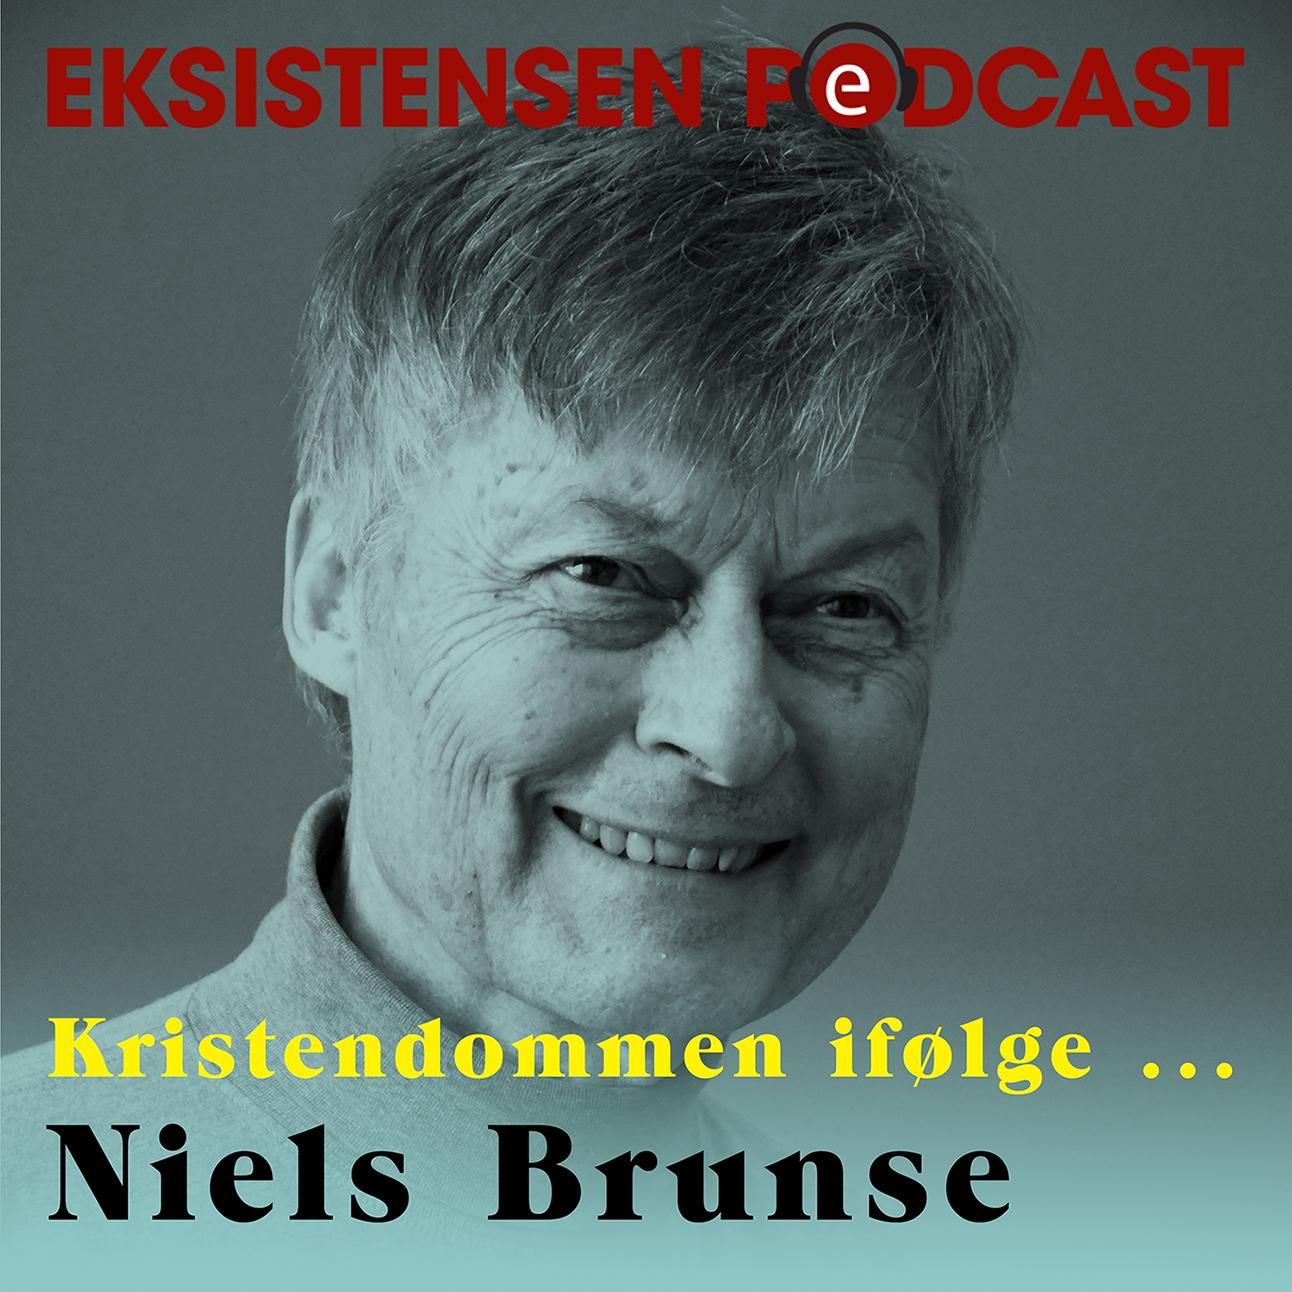 Niels Brunse